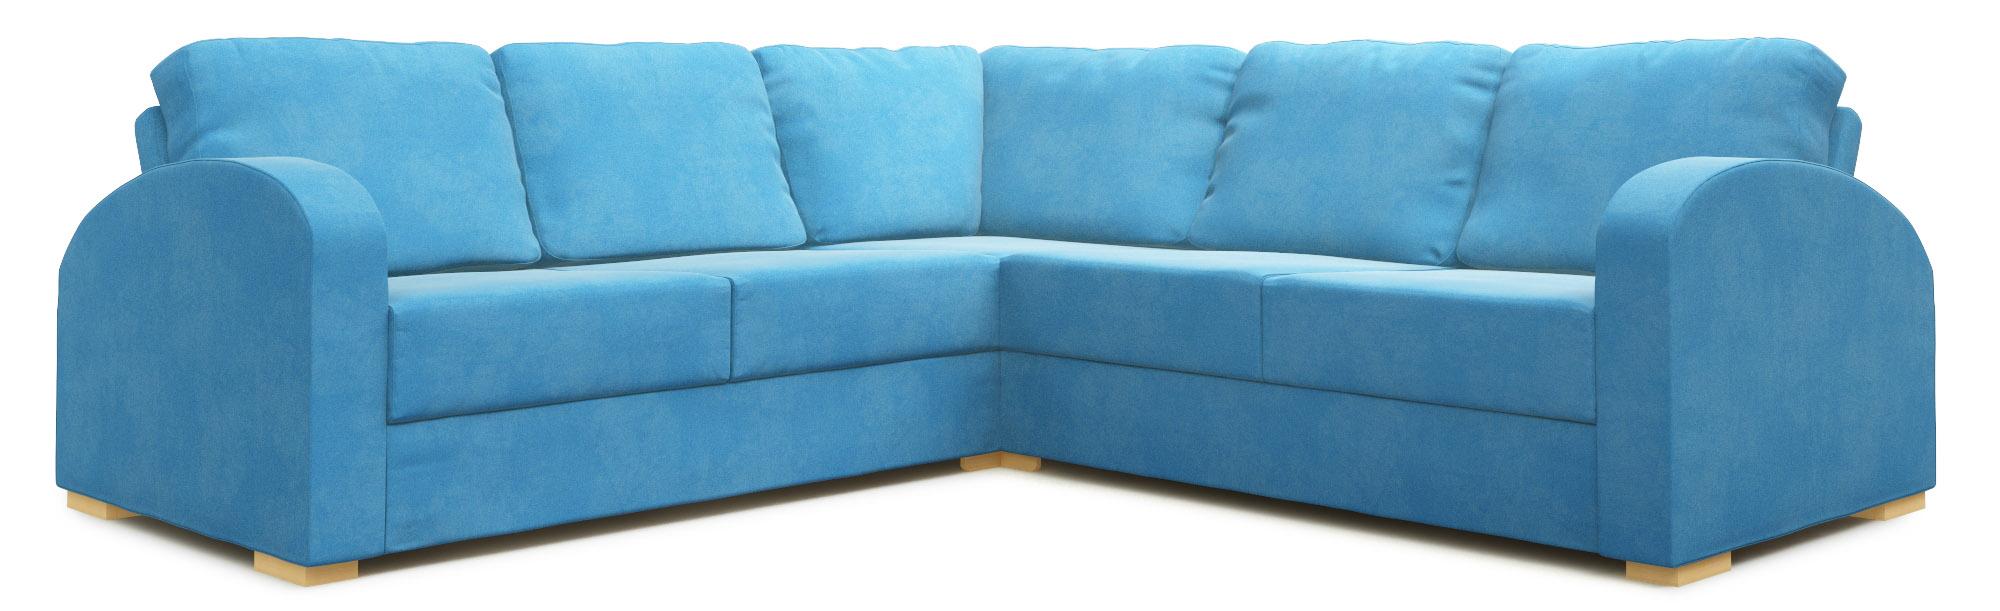 Holl 3X3 Corner Double Sofa Bed